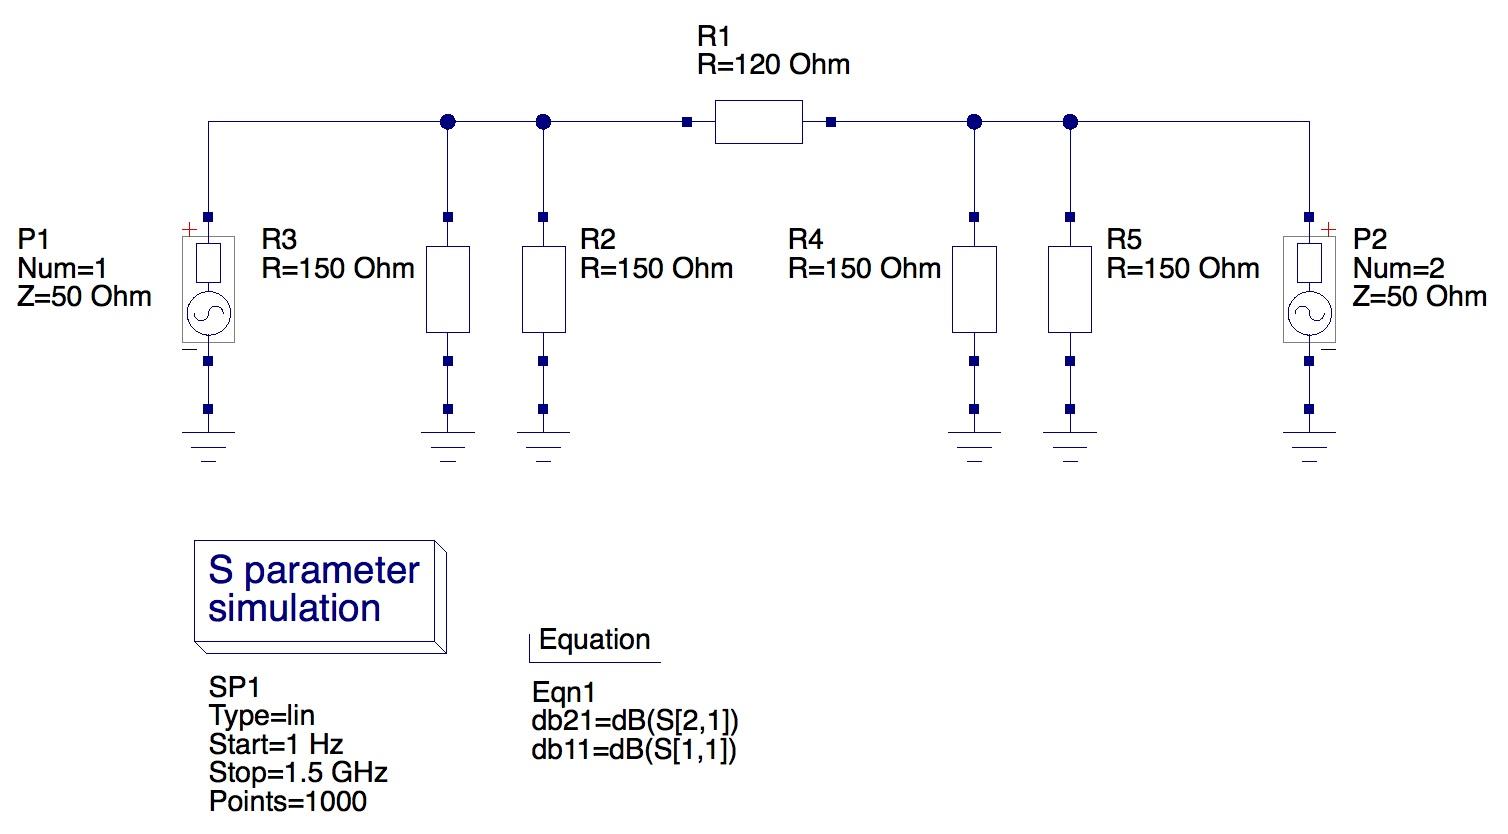 Simple 14dB attenuator model